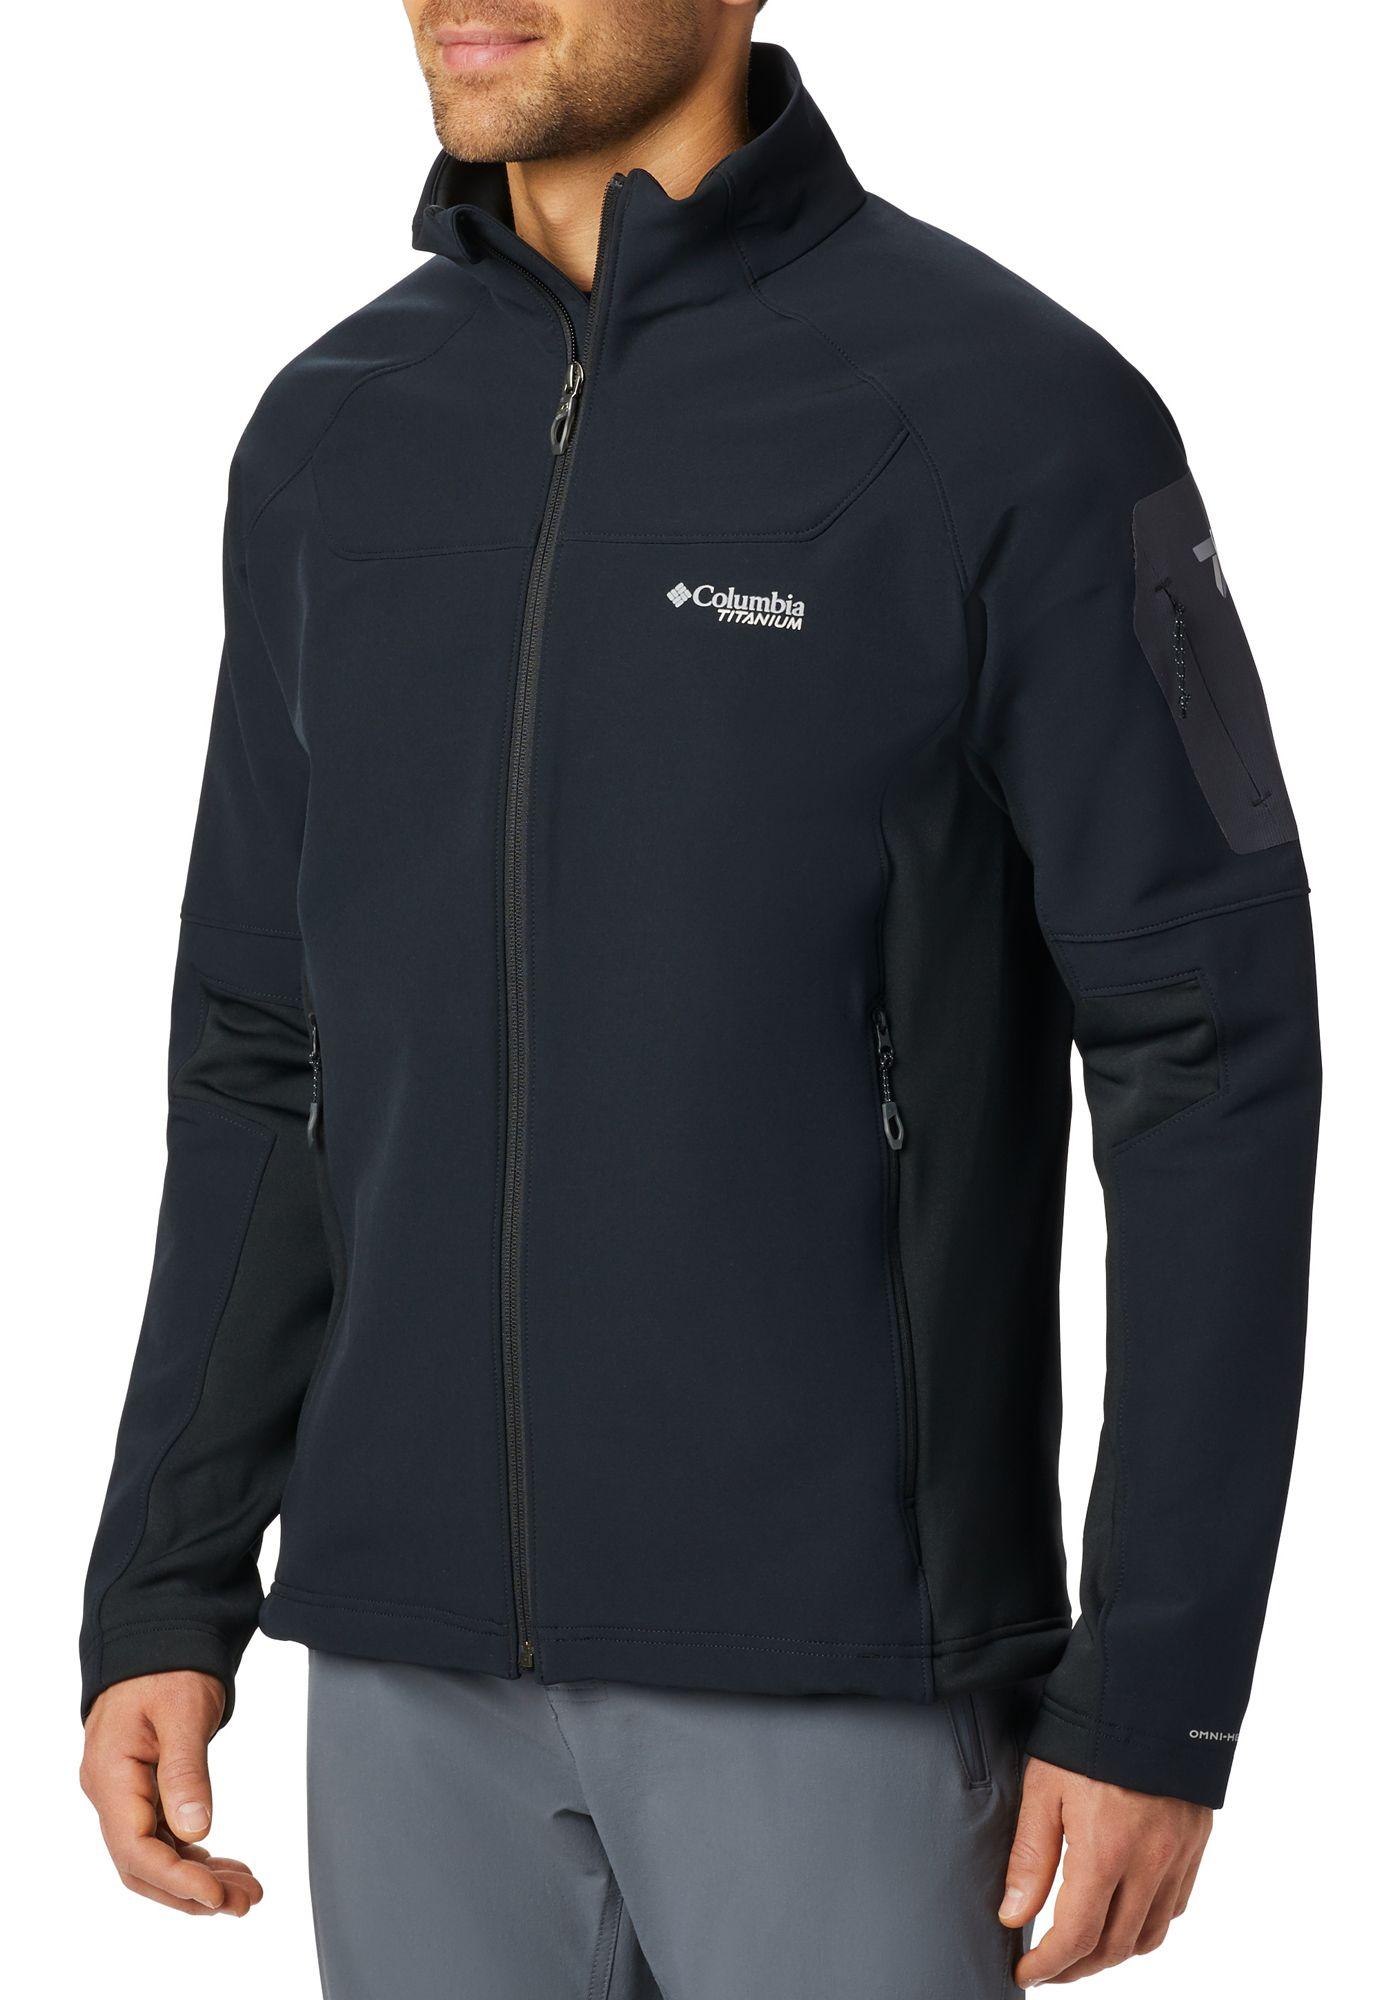 Columbia Men's Titan Ridge 2.0 Jacket